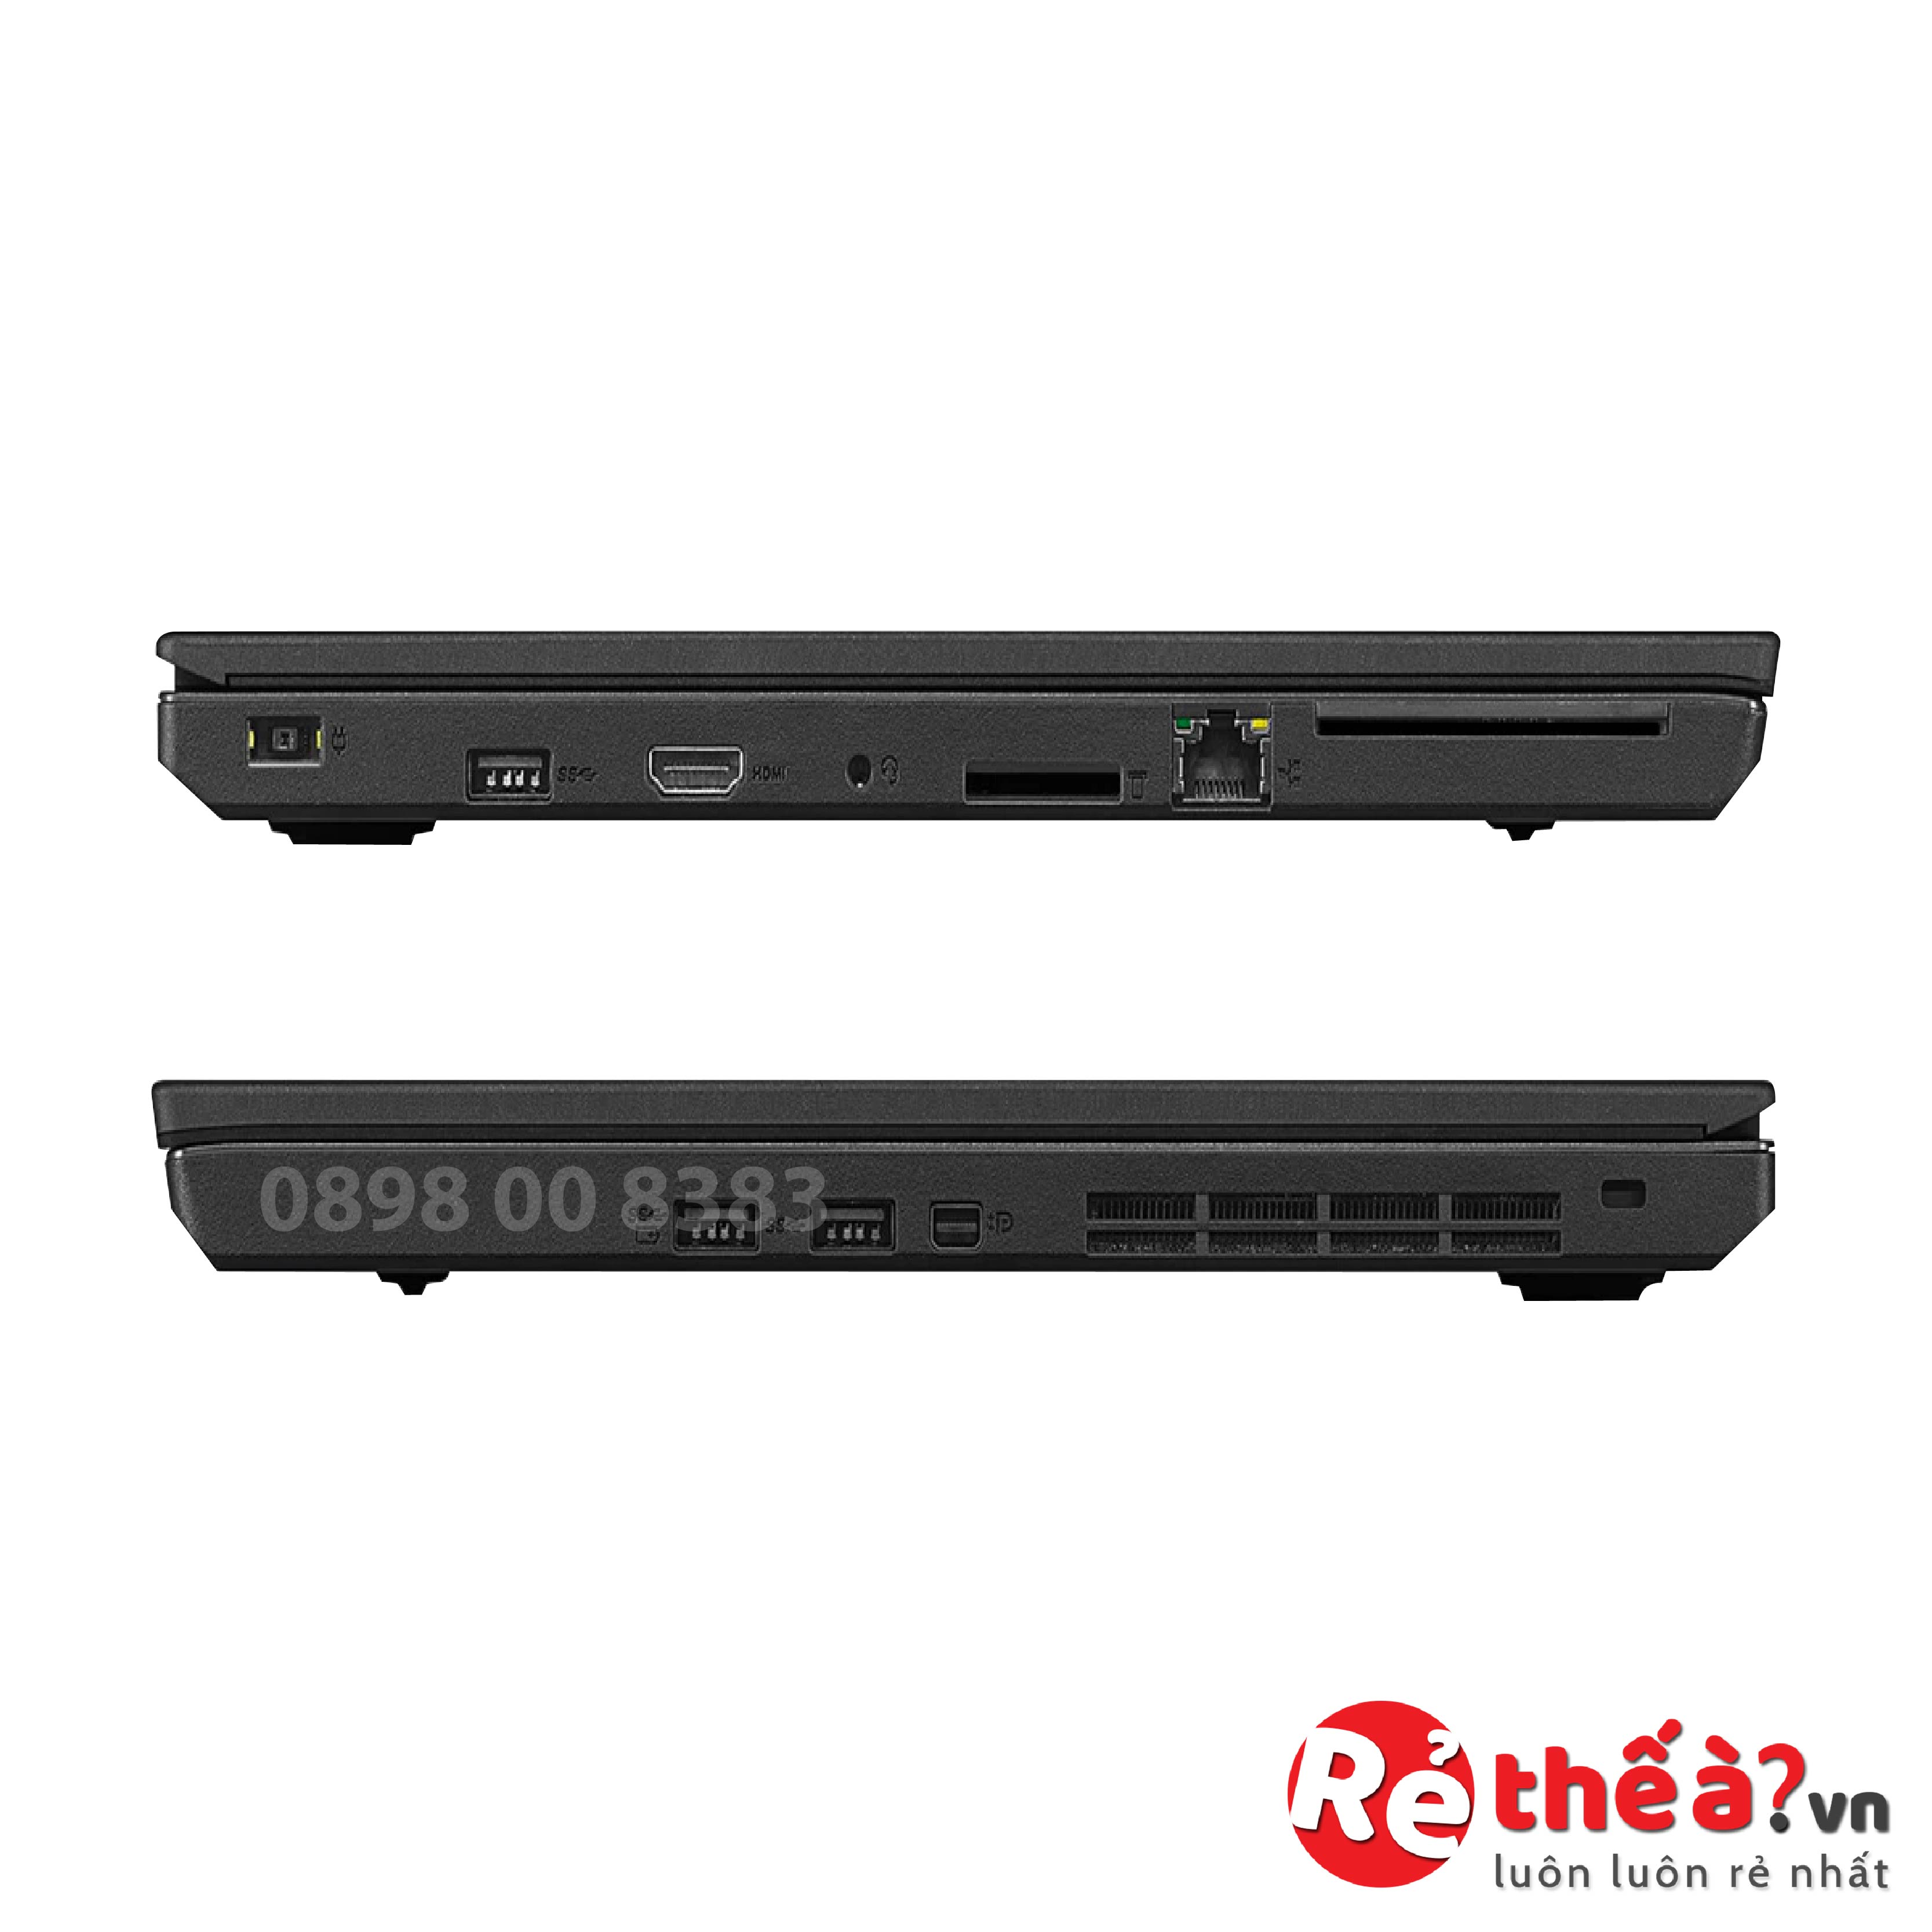 Laptop Lenovo Thinkpad T560